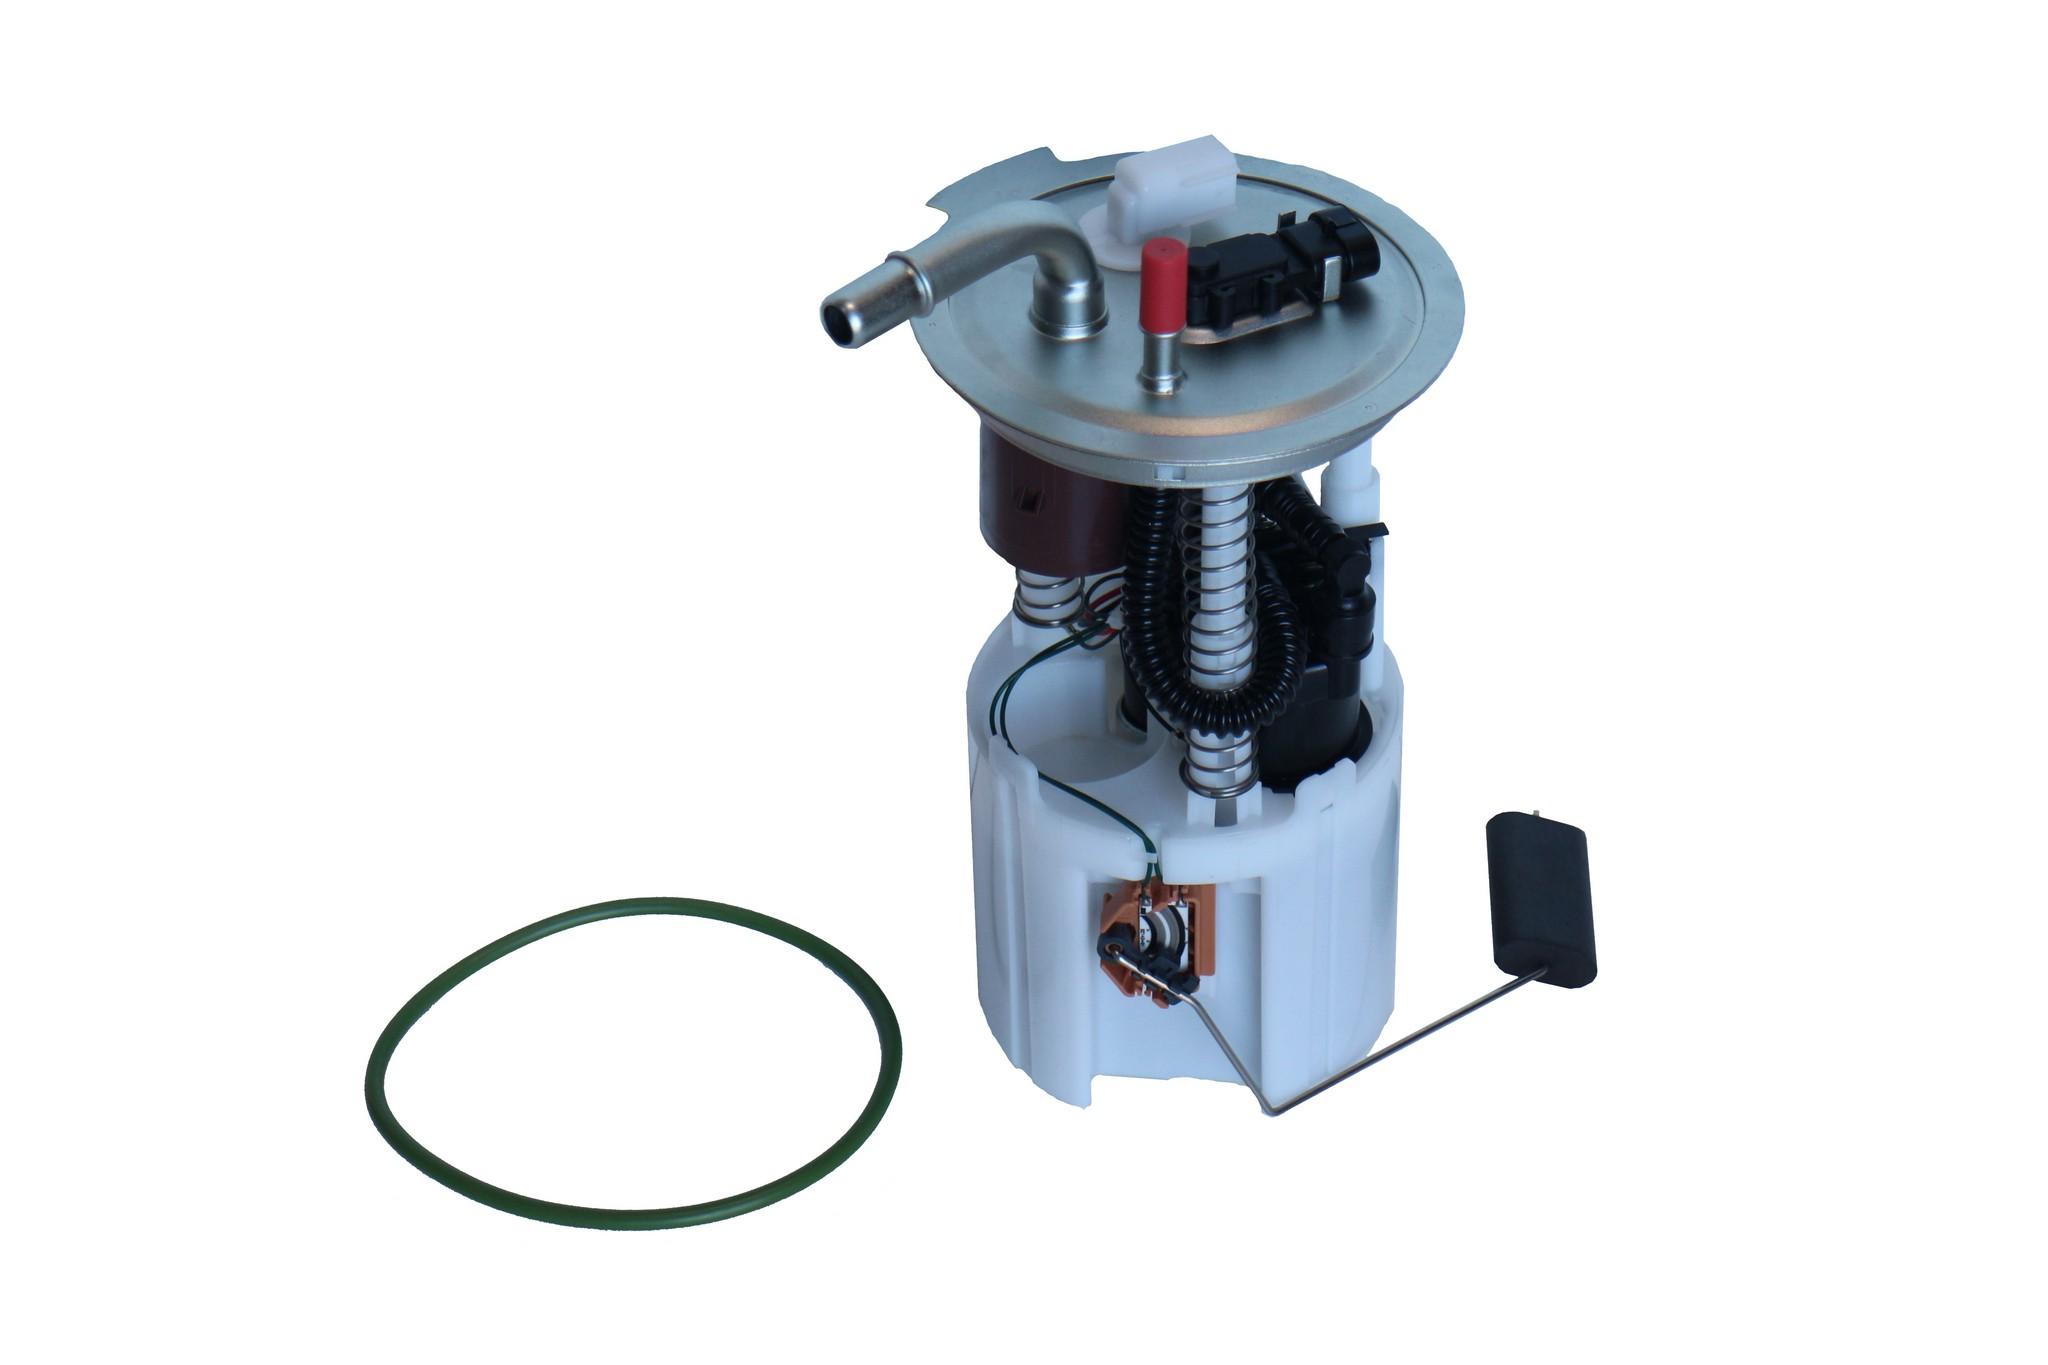 2005 Gmc Envoy Fuel Filter Location Pump Module Assembly 2048x1365